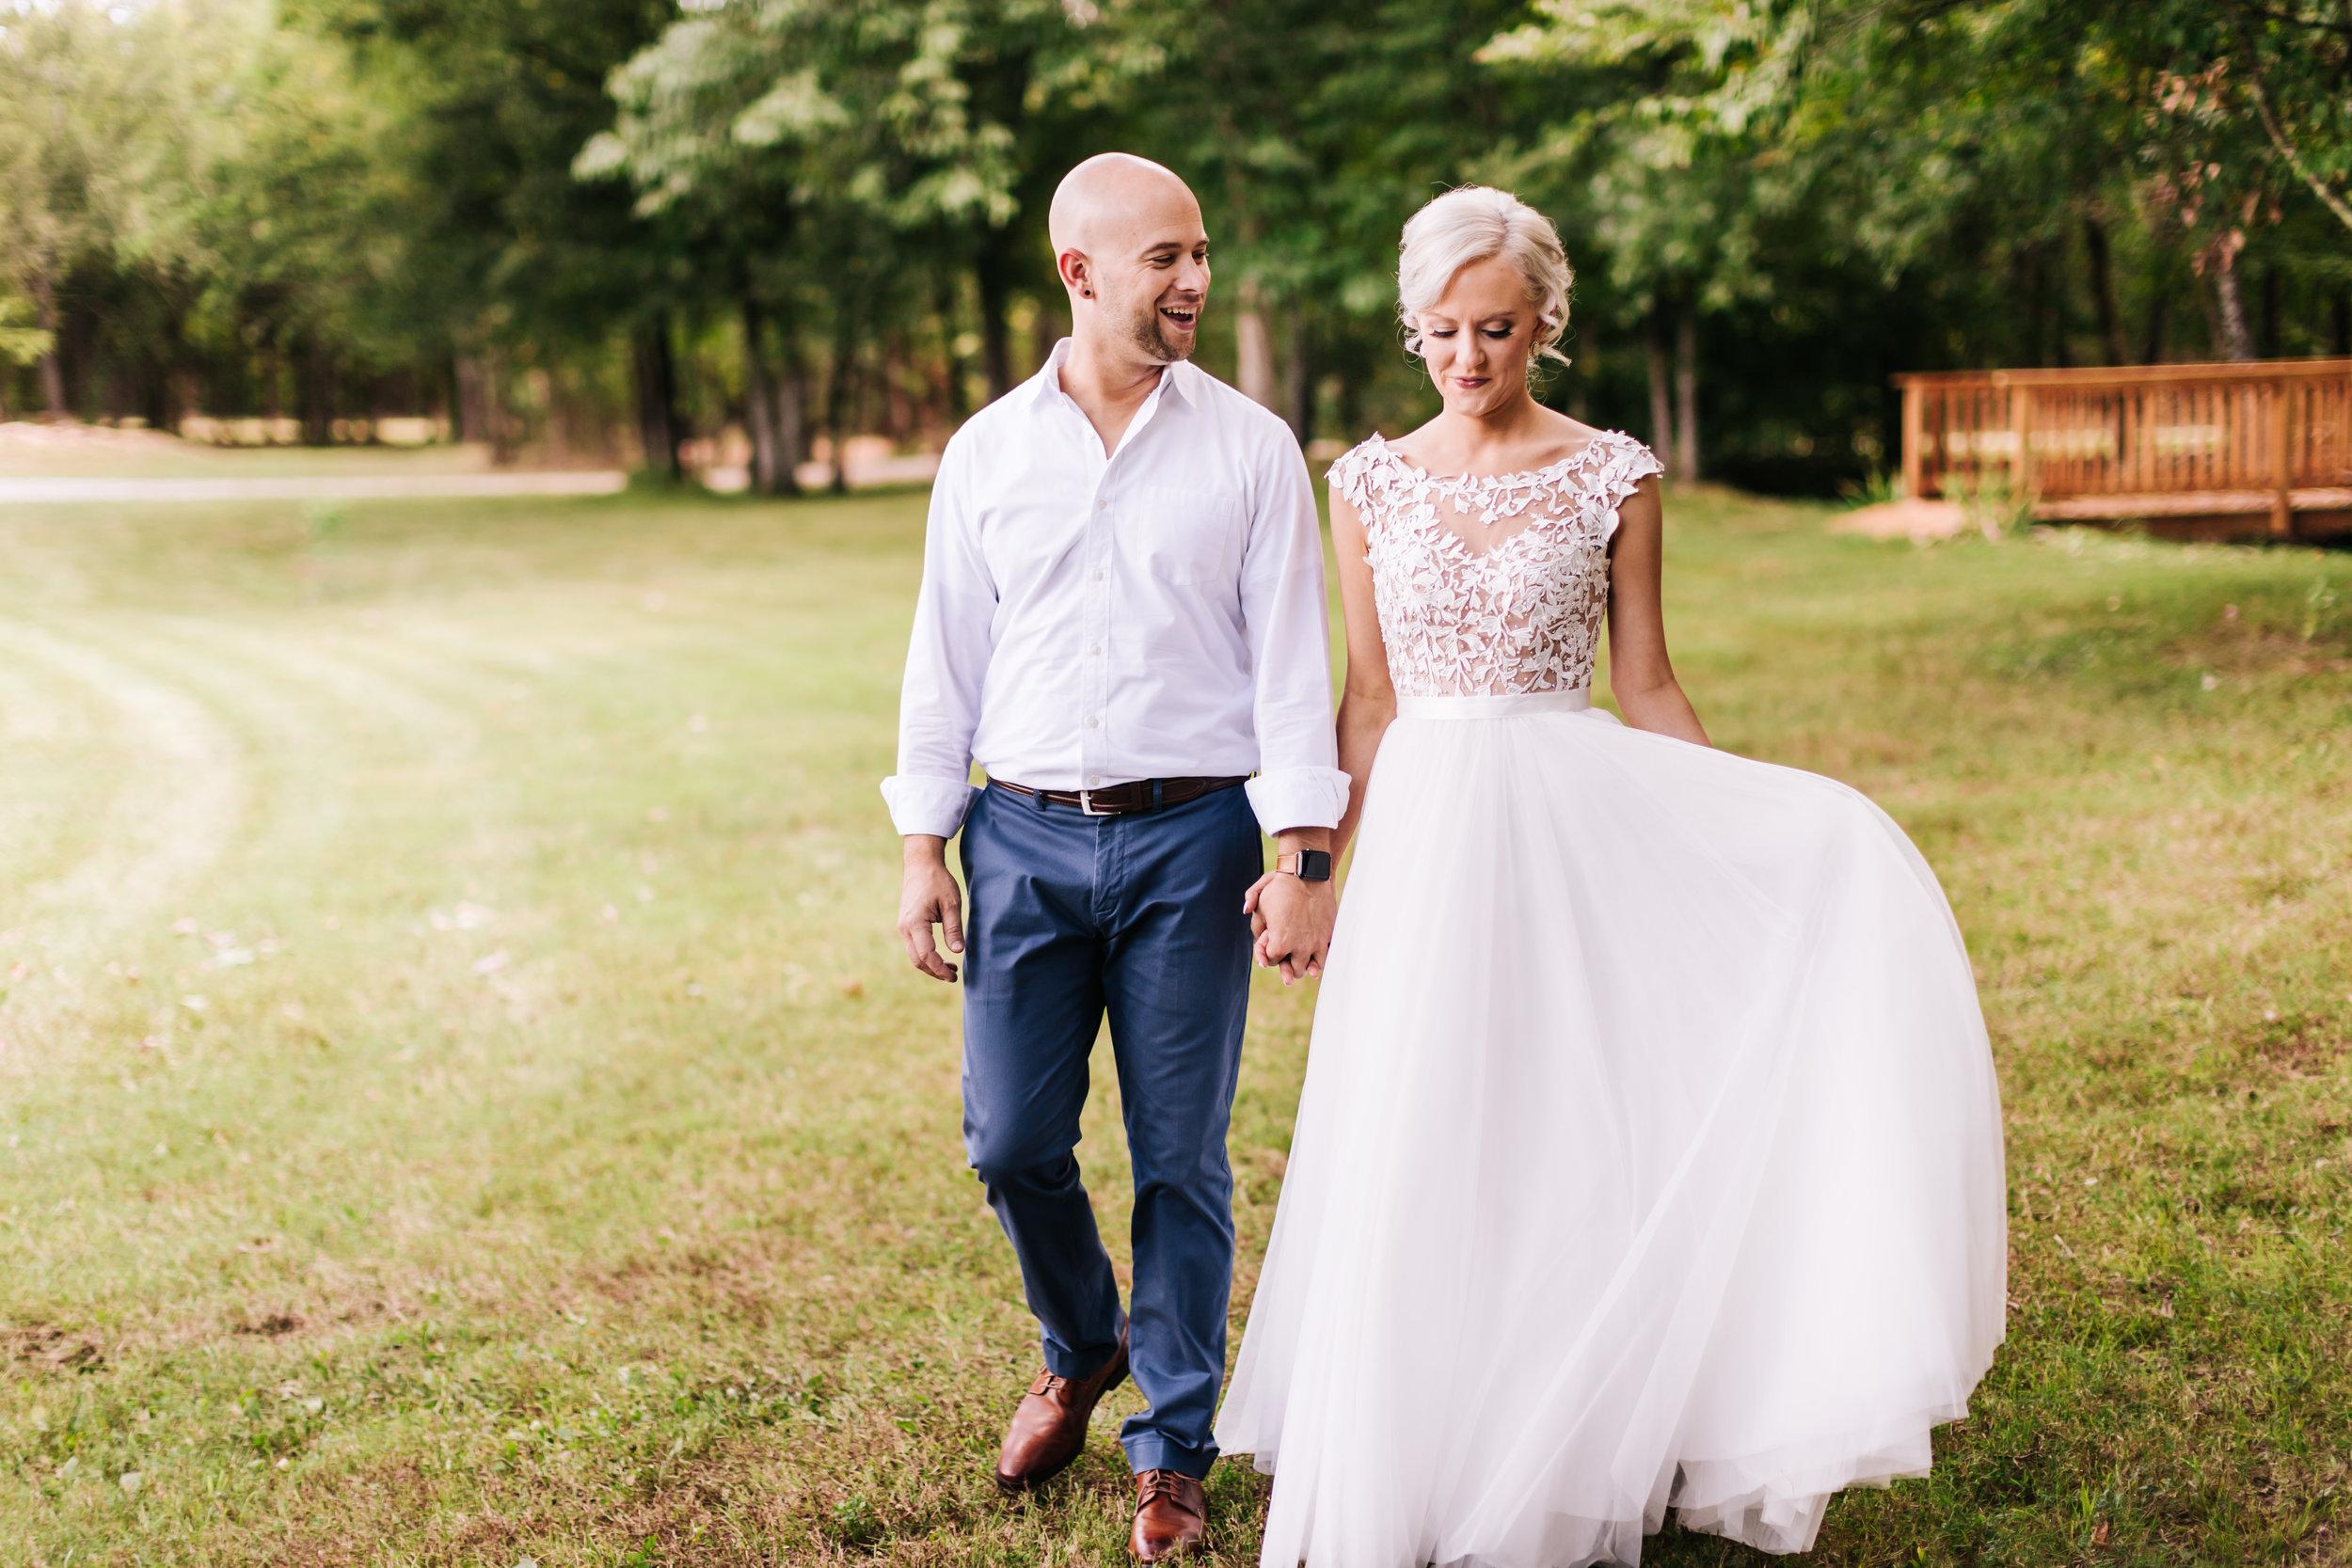 2018.09.02 Ray and Sarah Prizner Nashville TN Wedding FINALS-115.jpg